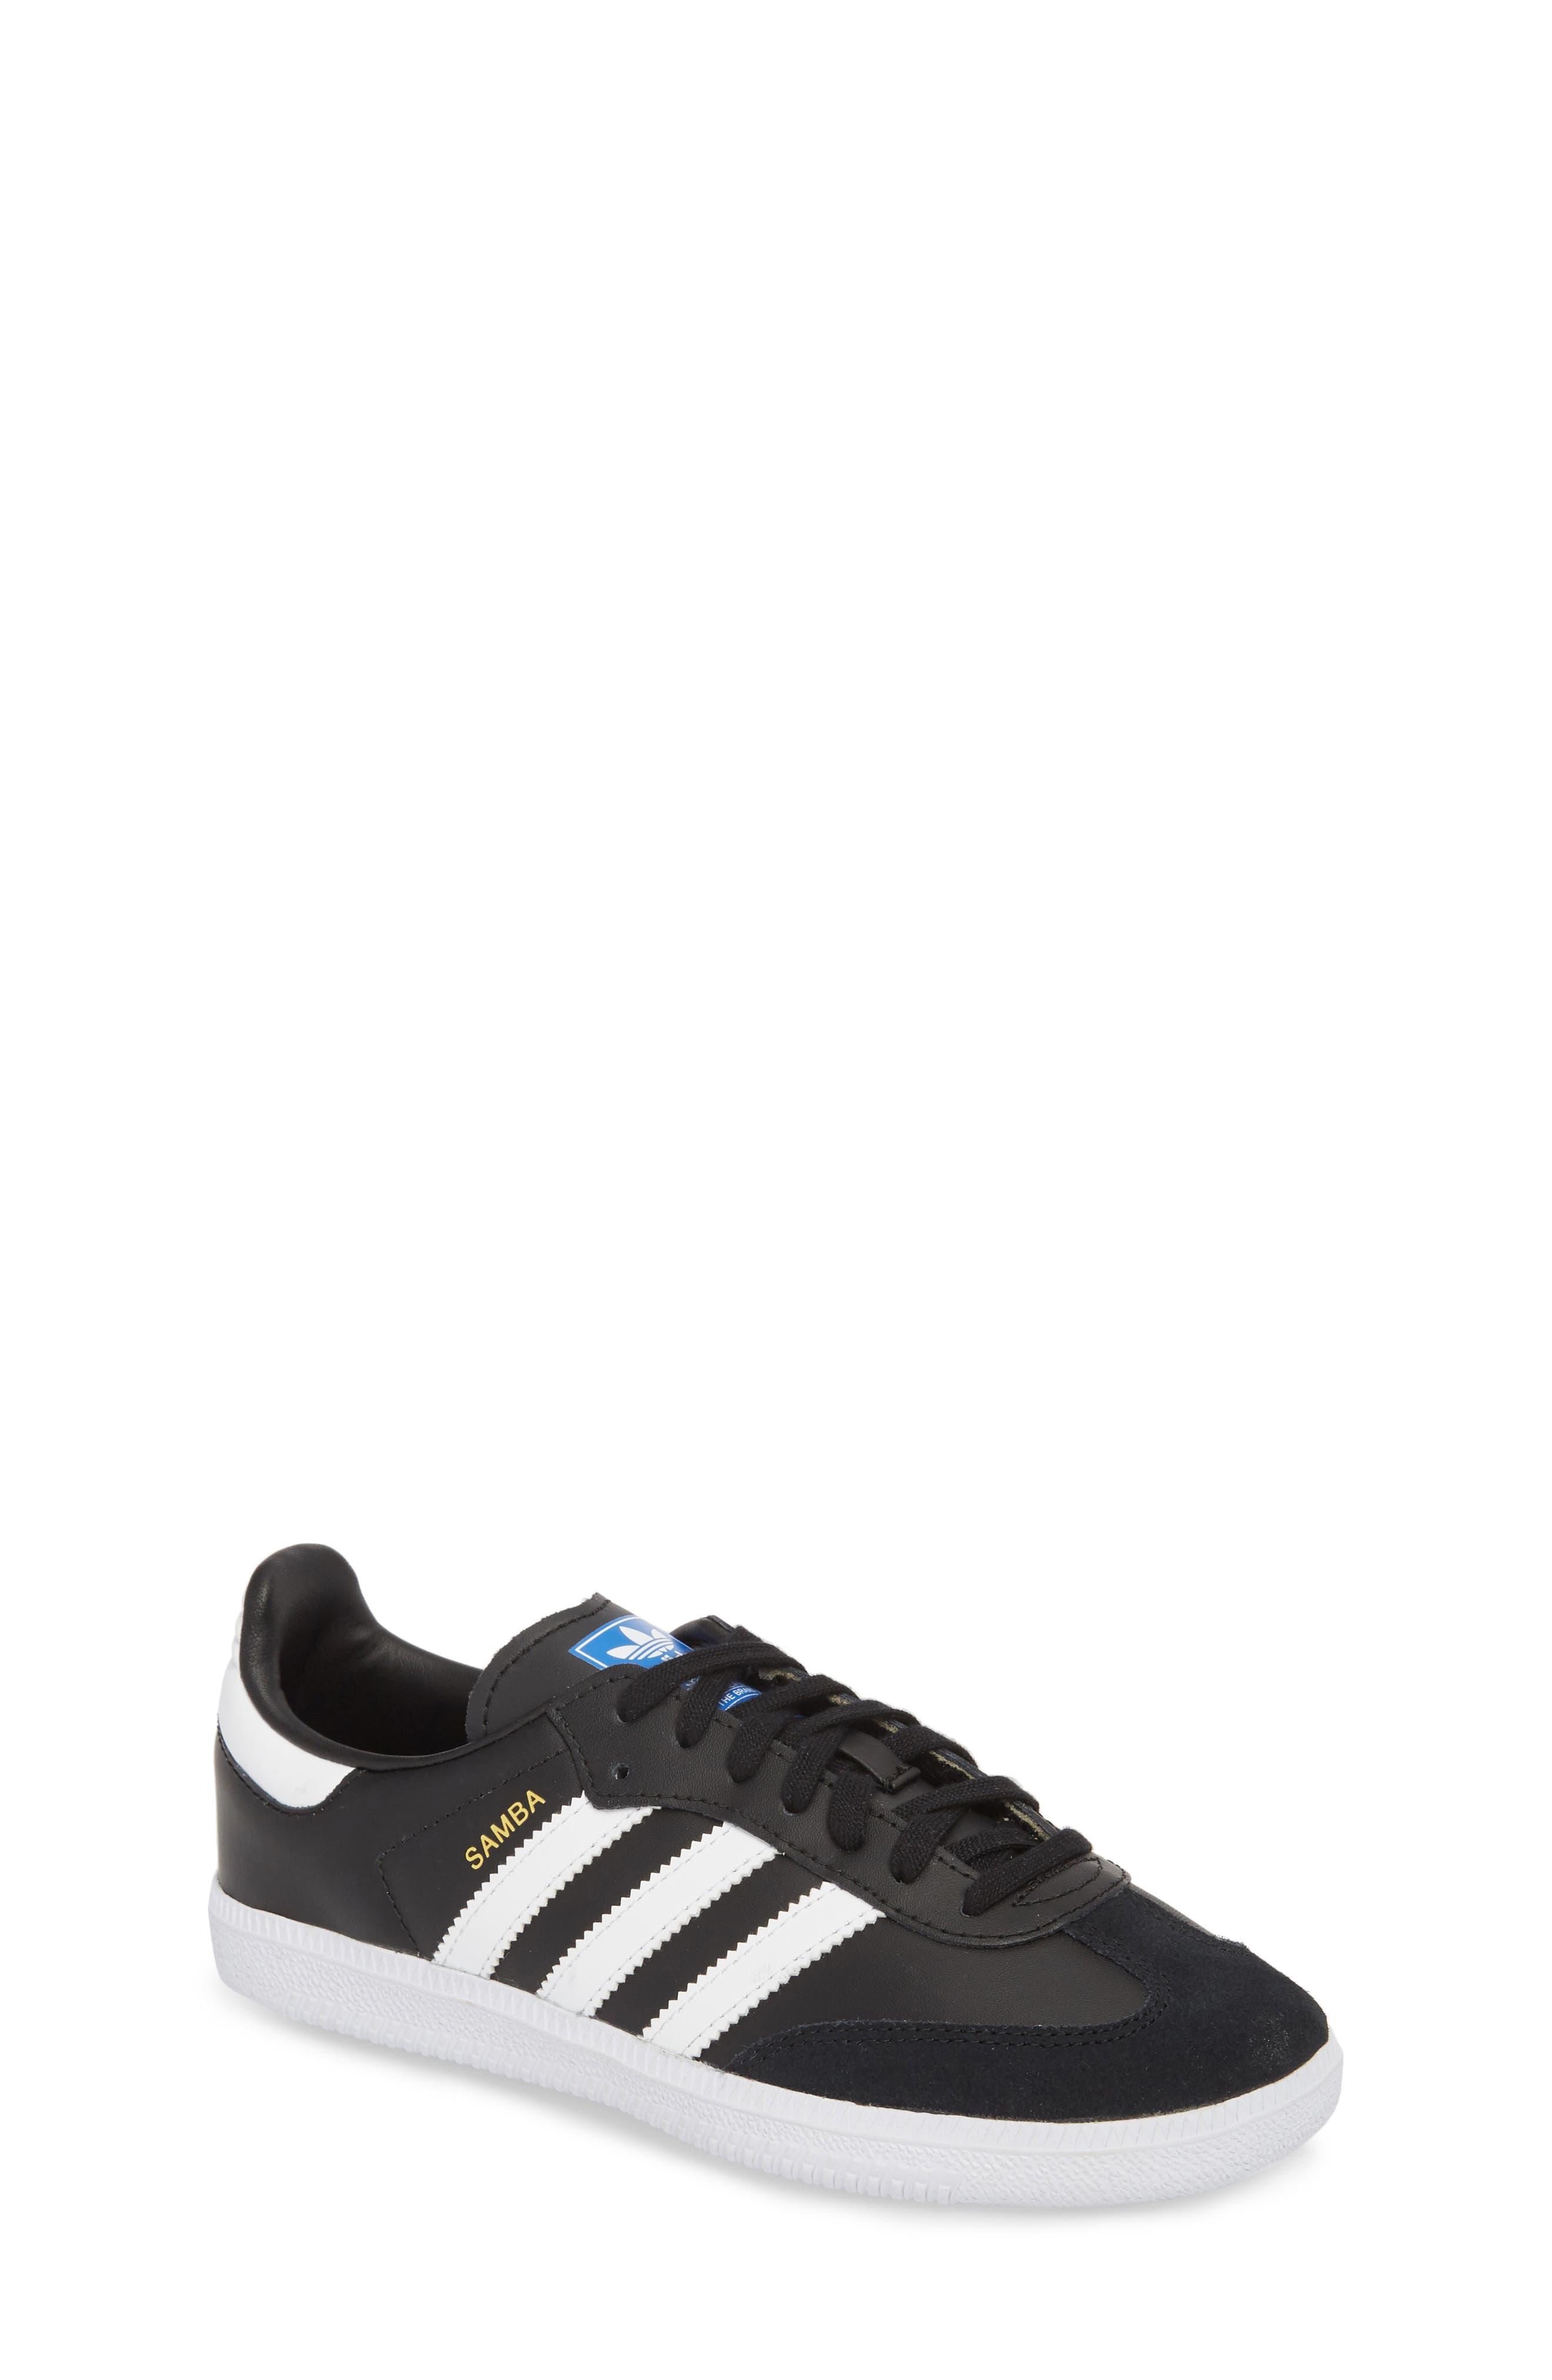 Samba OG Sneaker,                             Main thumbnail 1, color,                             CORE BLACK/ WHITE